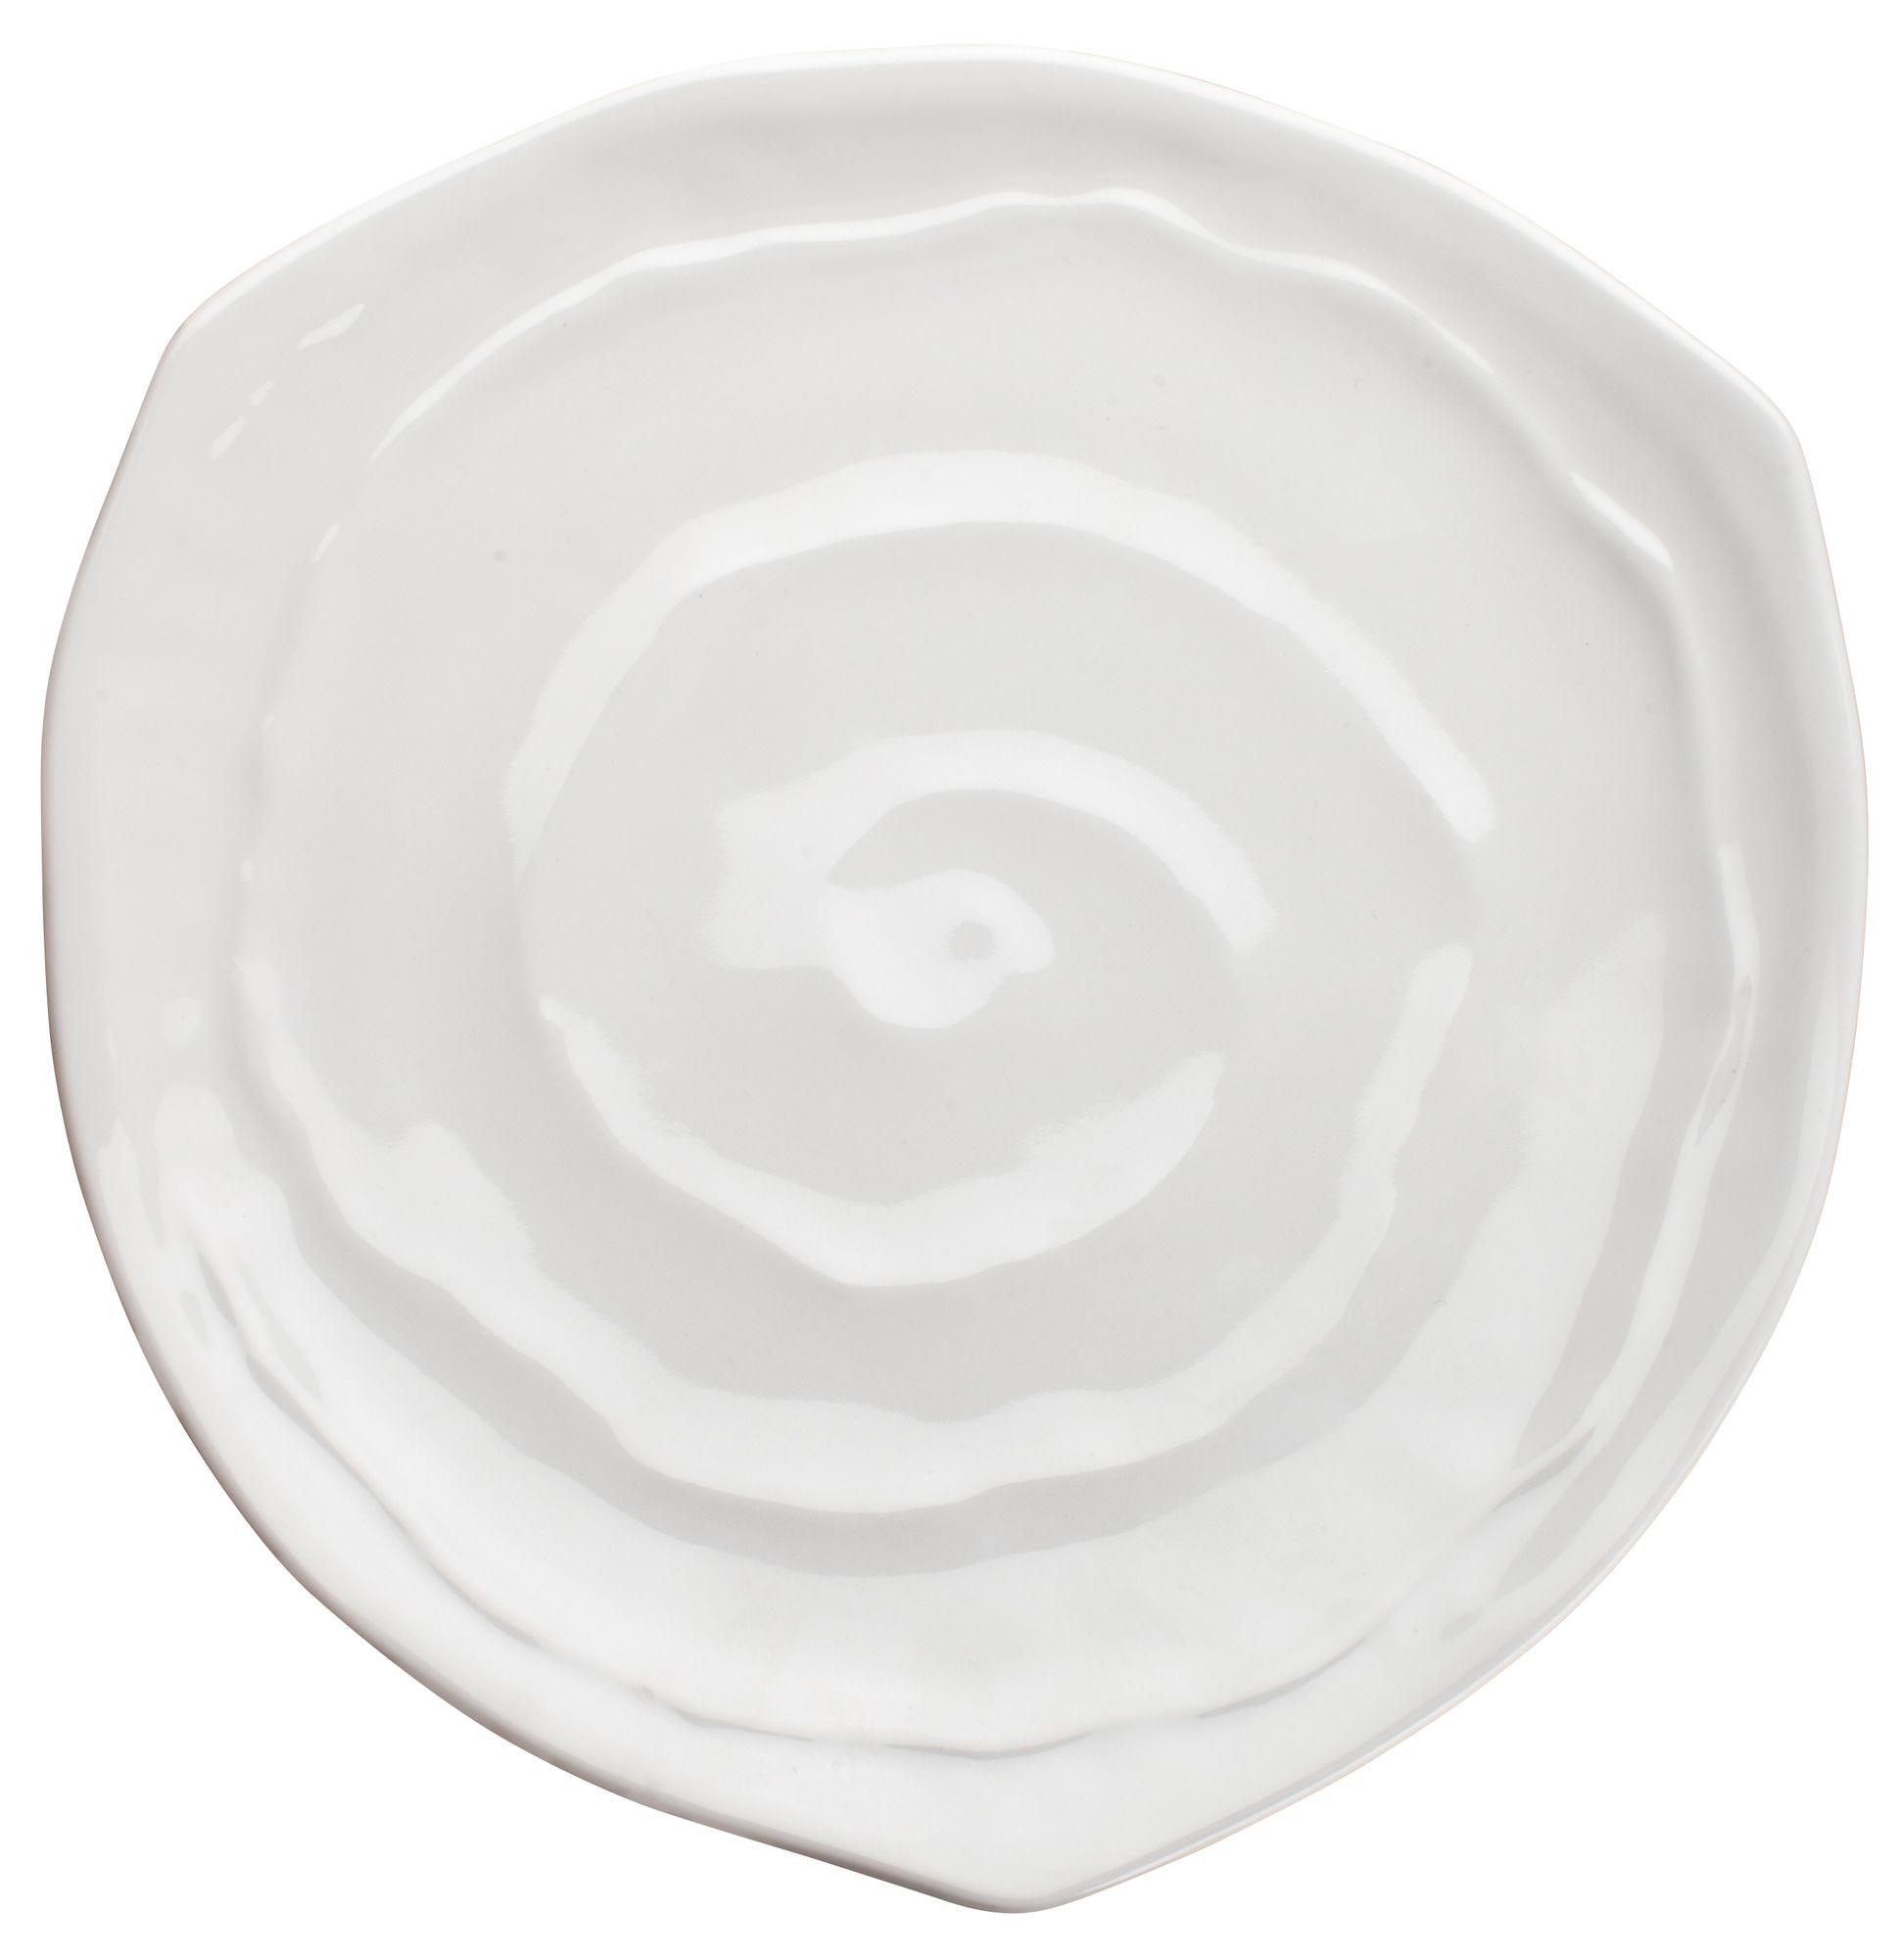 "Winco WDM007-201 Selena Melamine White Triangular Plate 9"""